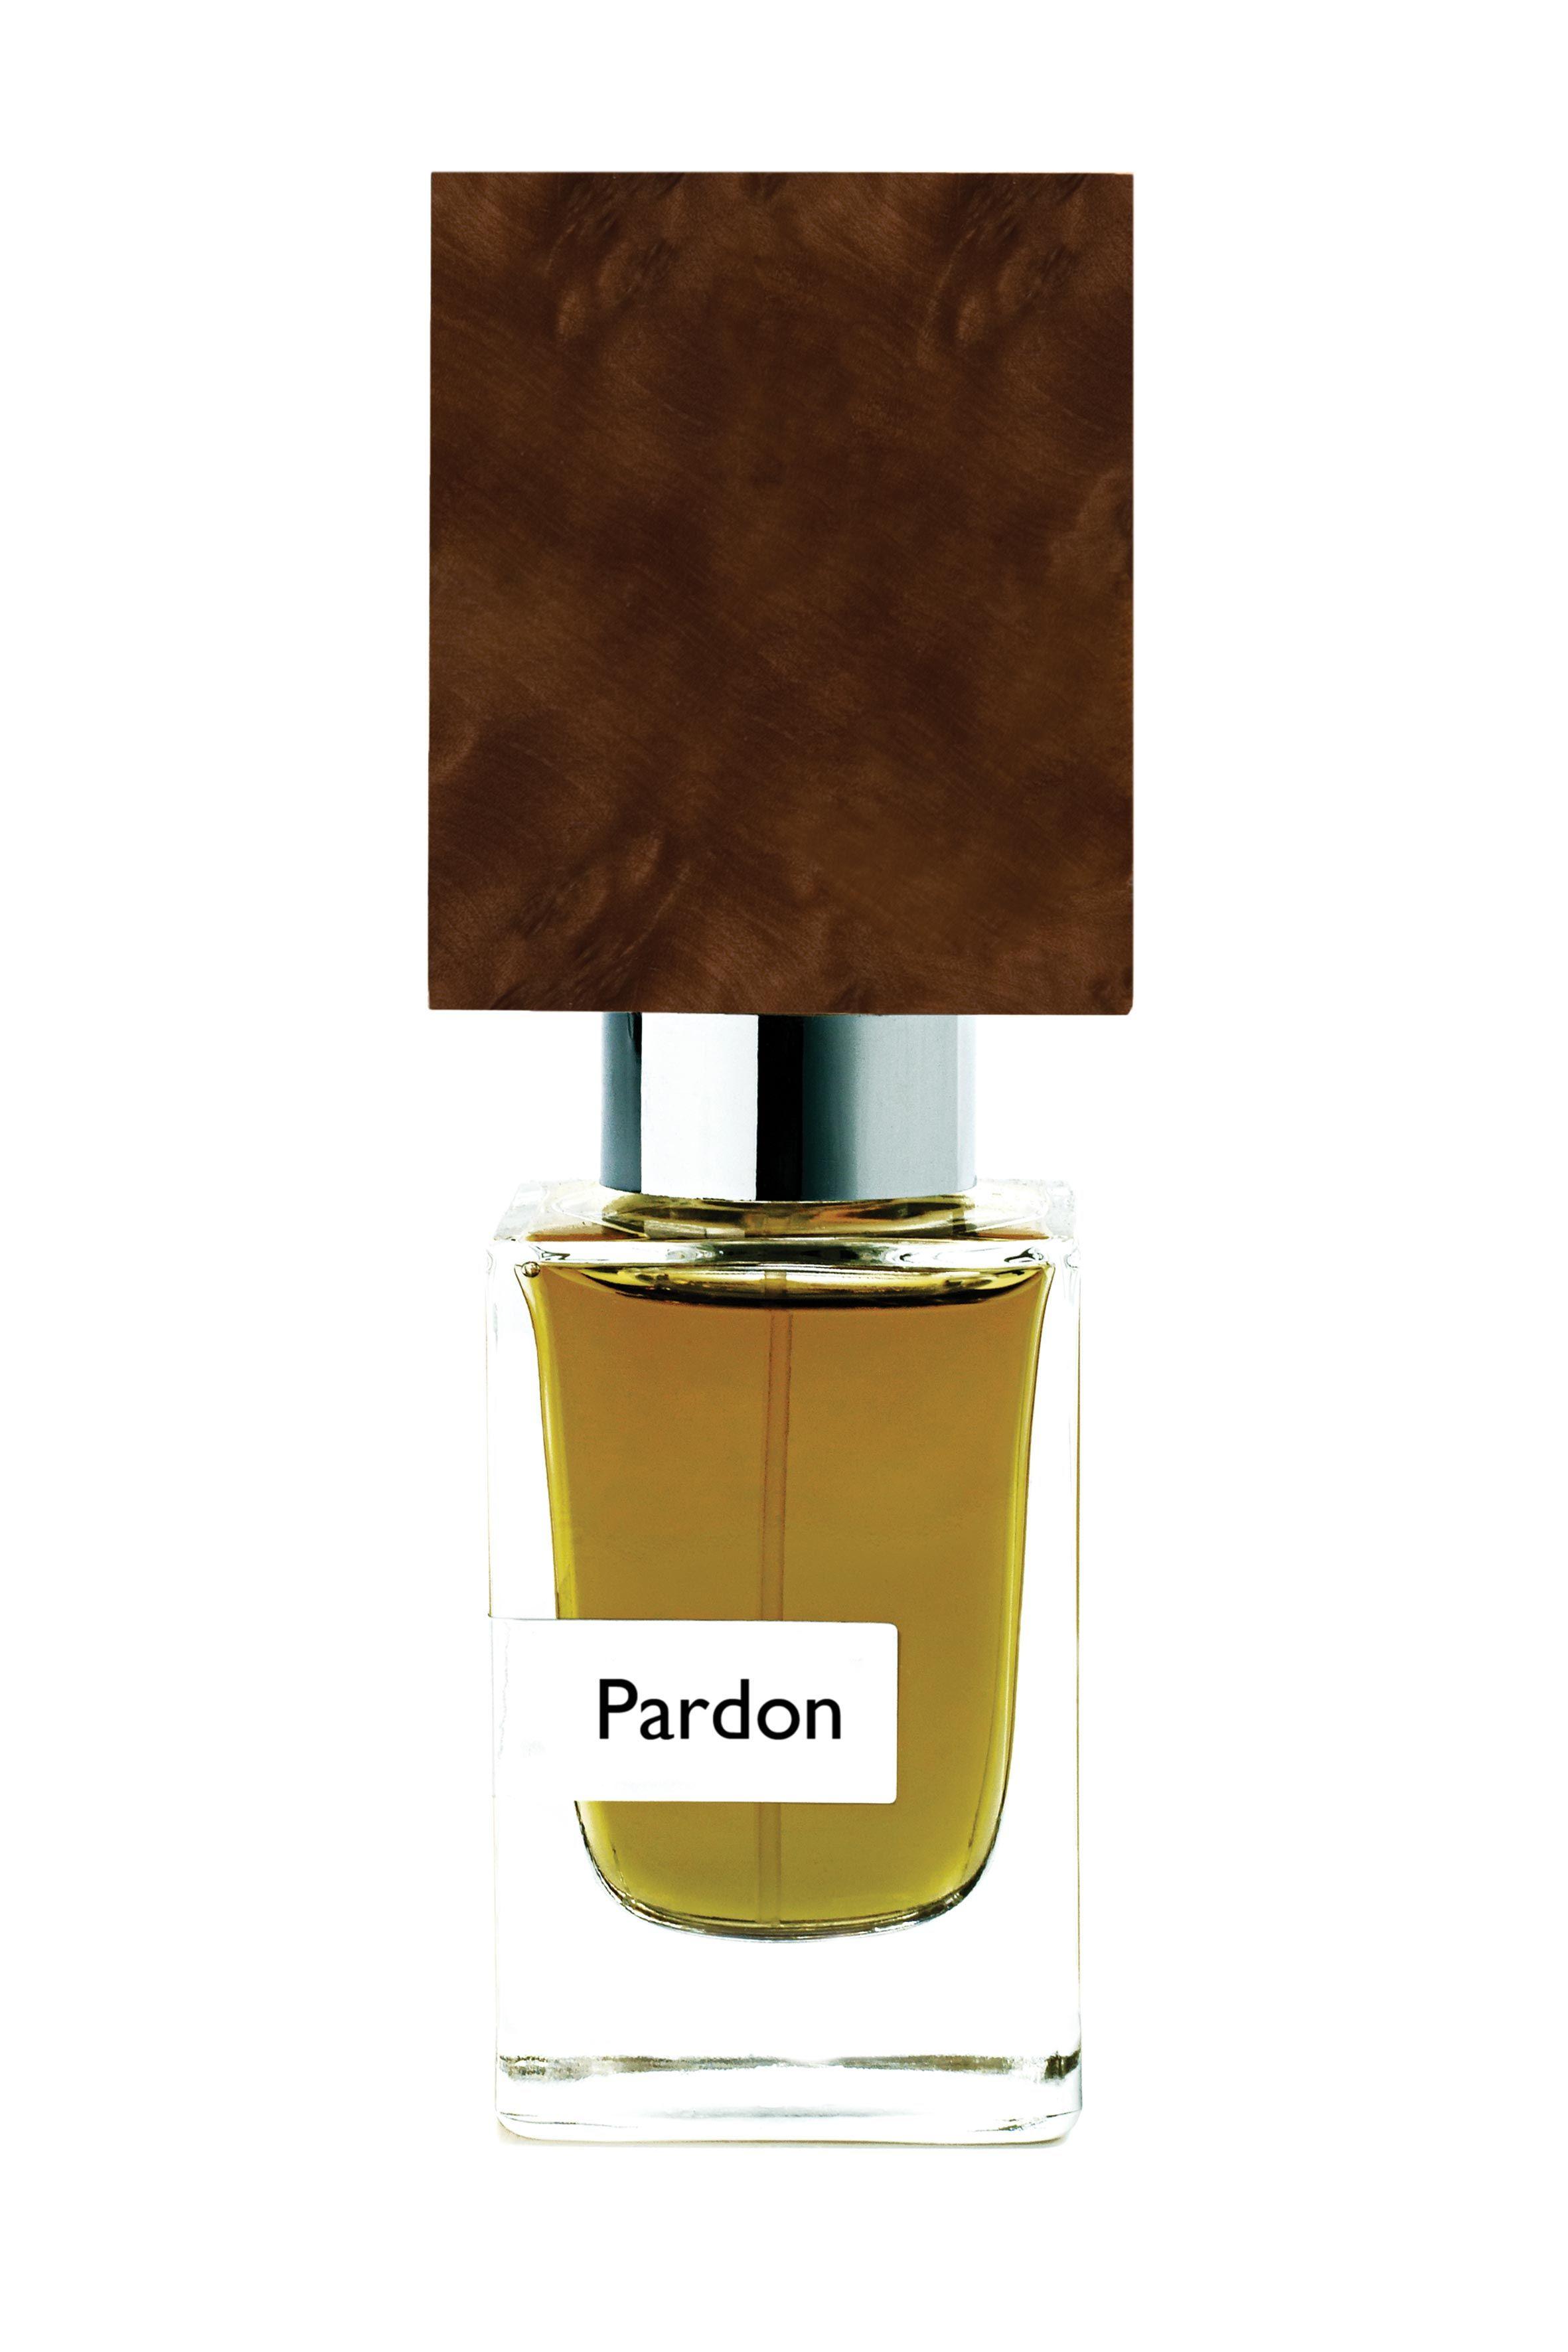 Pardon-3313